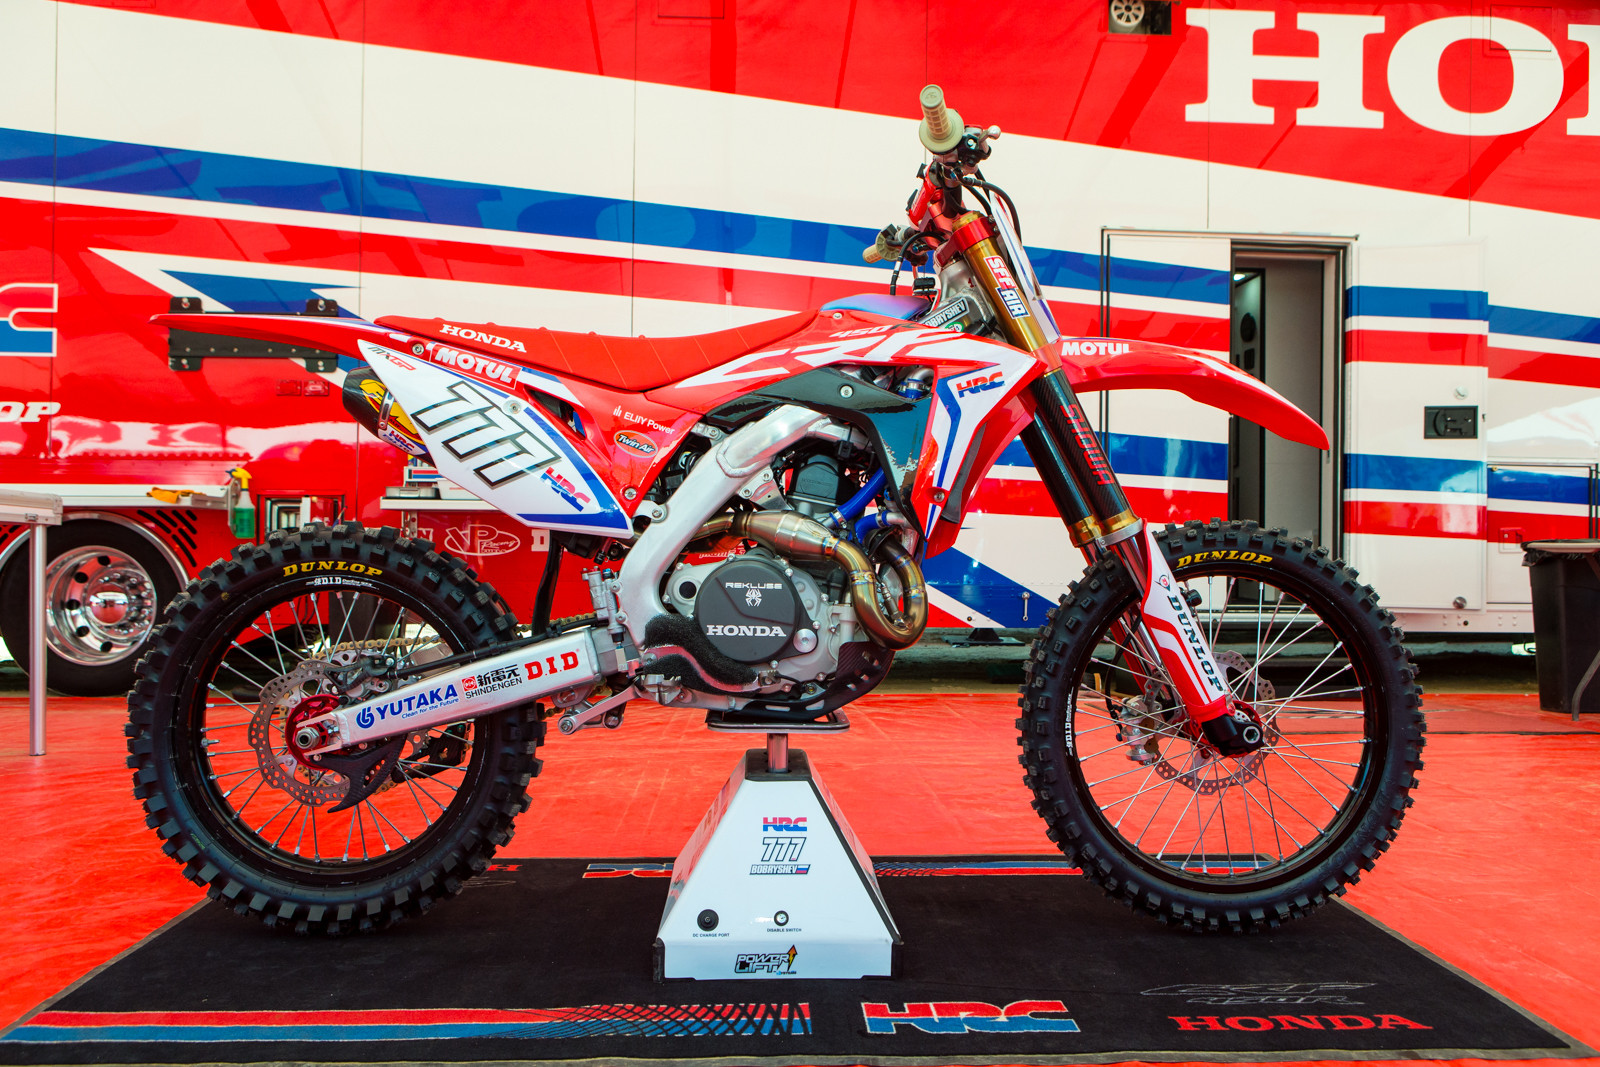 Evgeny Bobryshev's 2017 HRC Honda CRF450RW - Vital MX Pit Bits: 2016 MXGP of USA - Motocross Pictures - Vital MX